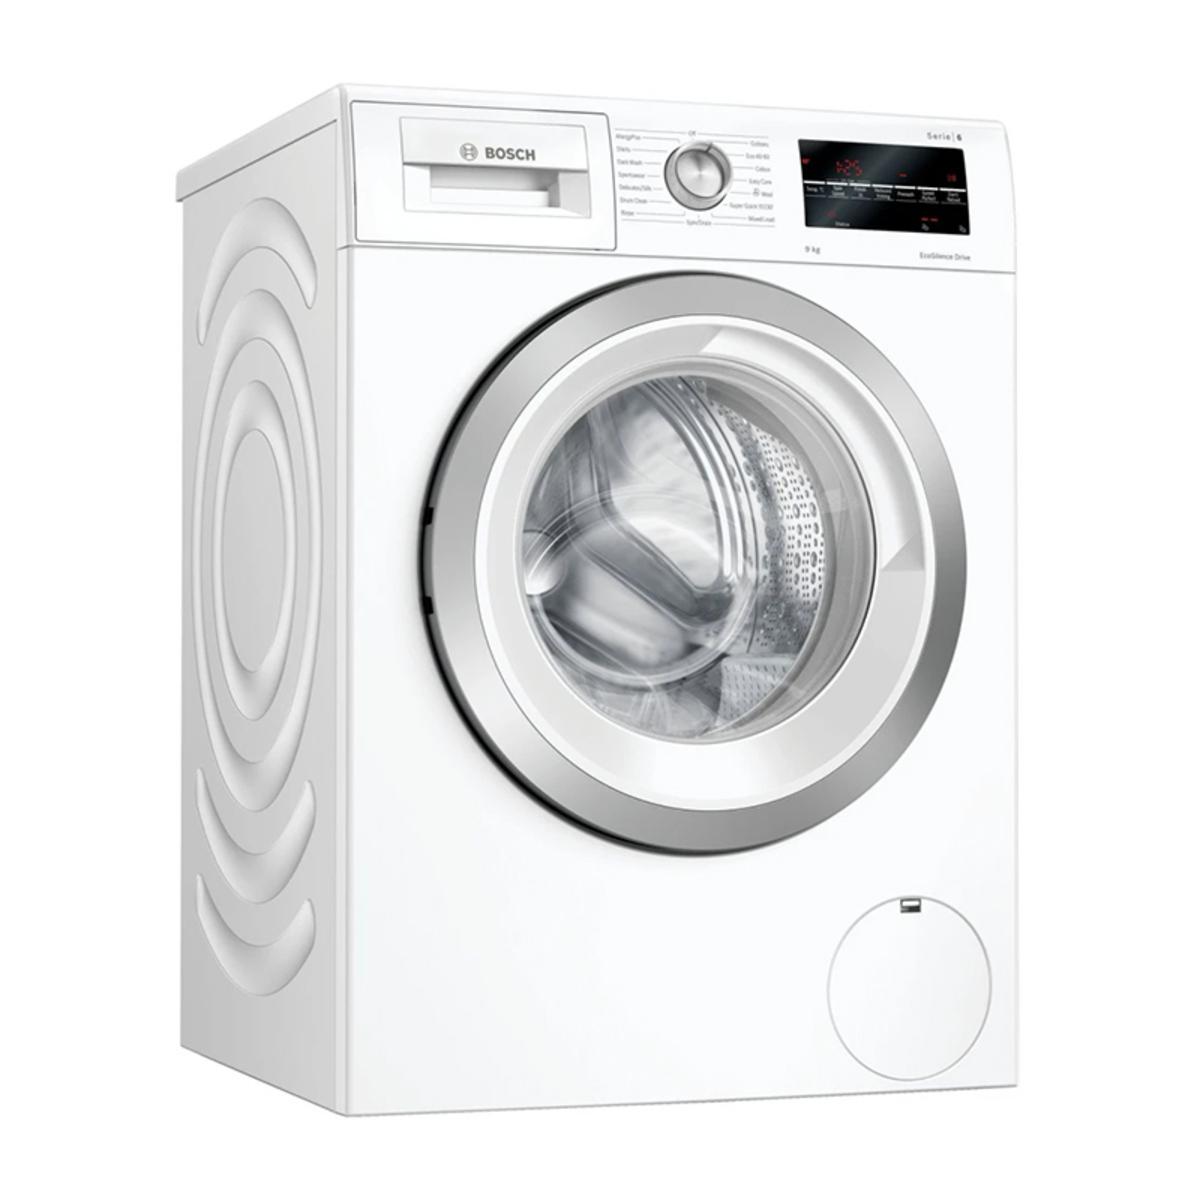 Bosch WAU28PH9GB A+++ 9kg 1400 Spin Washing Machine in White